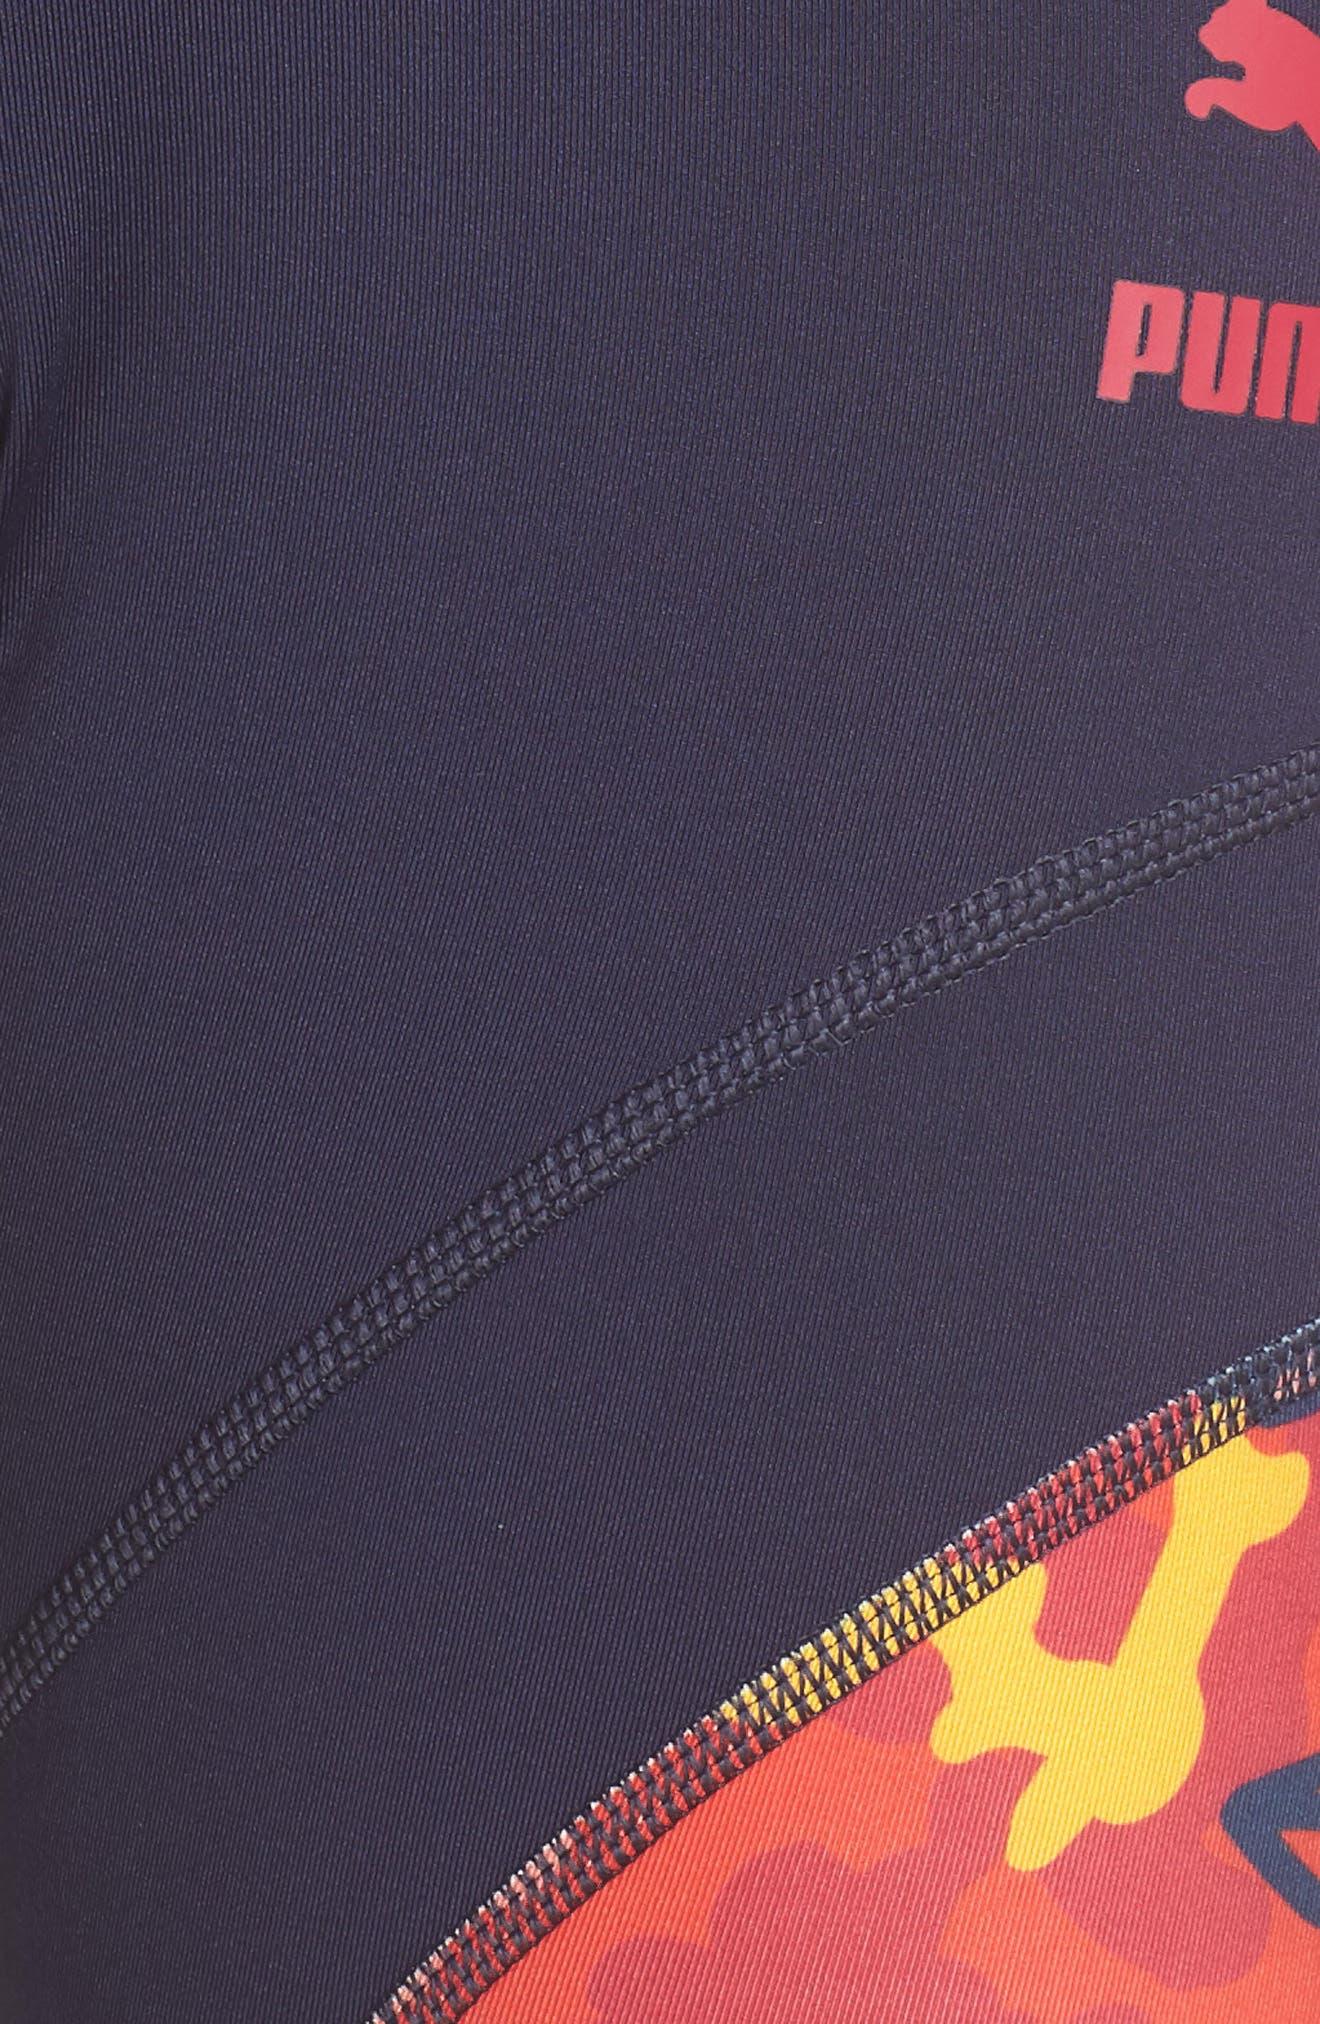 PUMA, Flourish Flourish XTG Leggings, Alternate thumbnail 6, color, PEACOAT-HIBISCUS MULTI